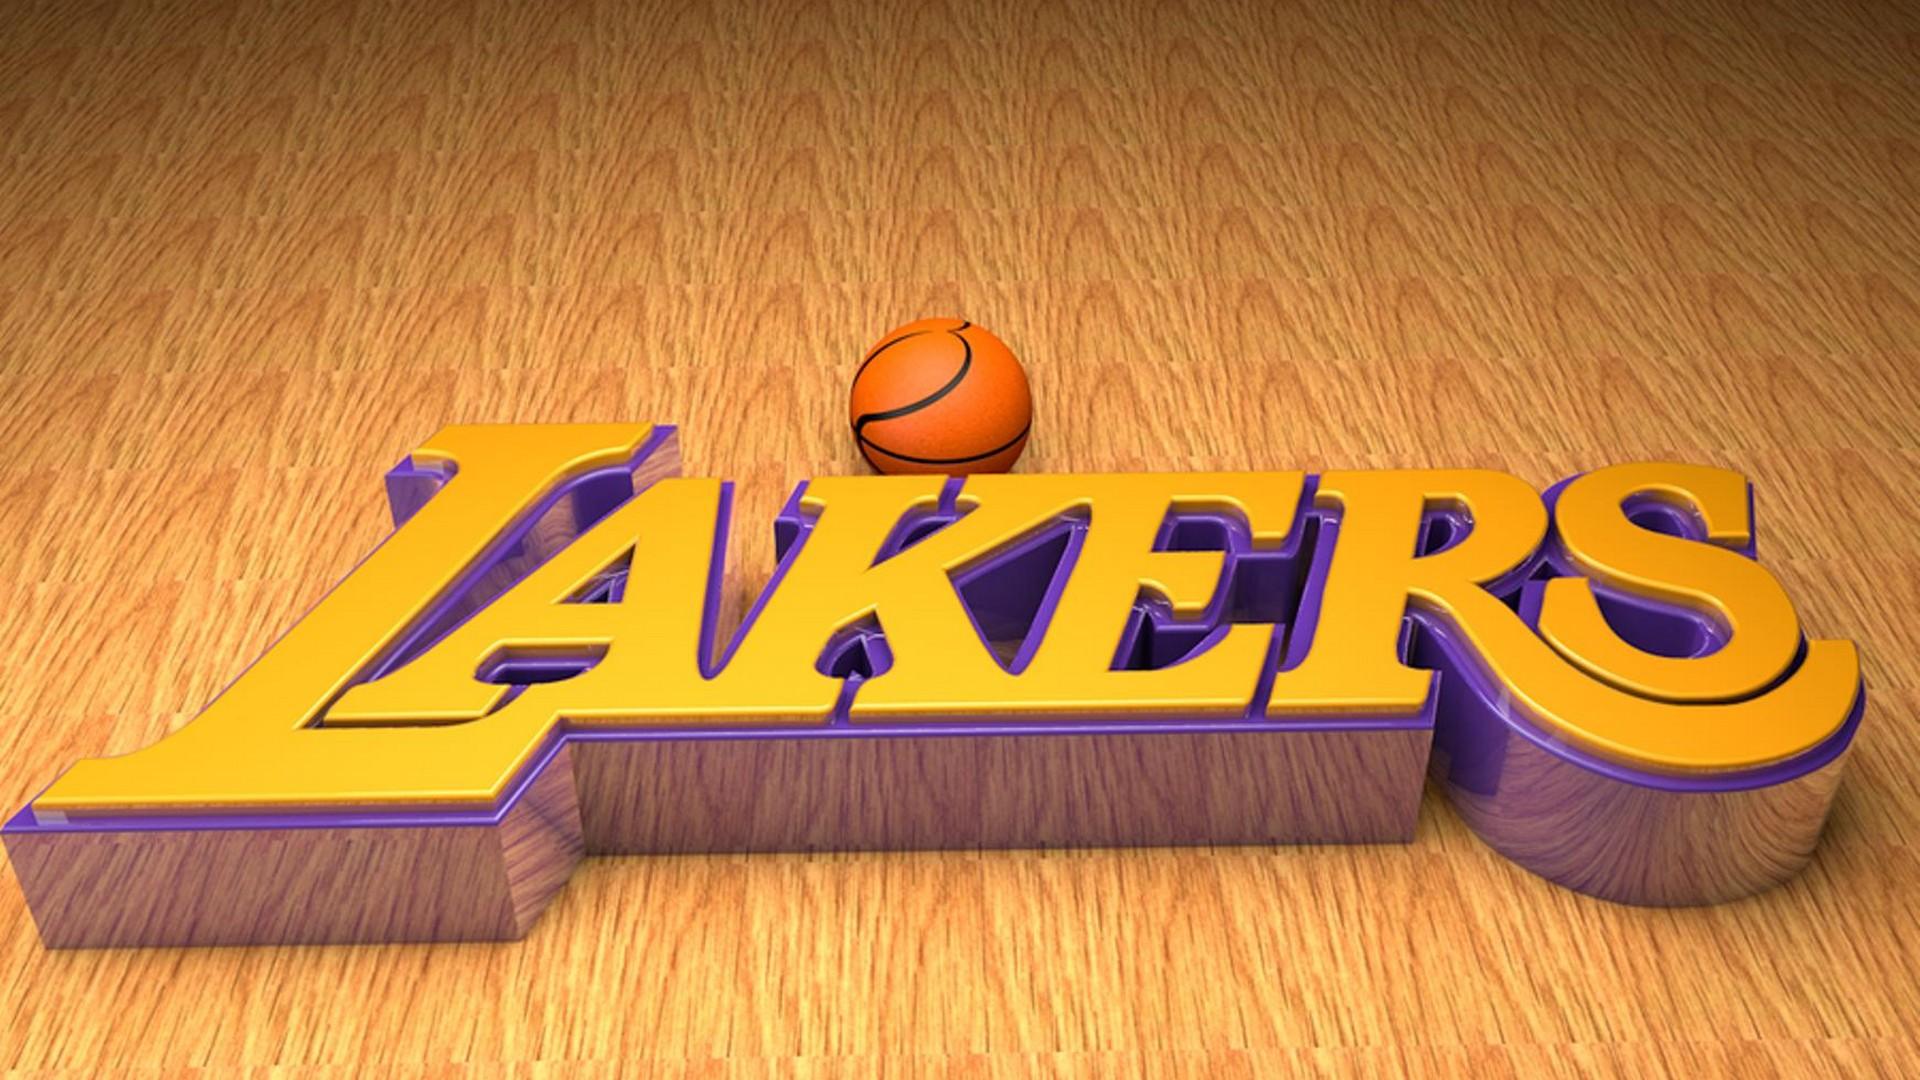 HD Los Angeles Lakers Wallpapers 2020 Basketball Wallpaper 1920x1080